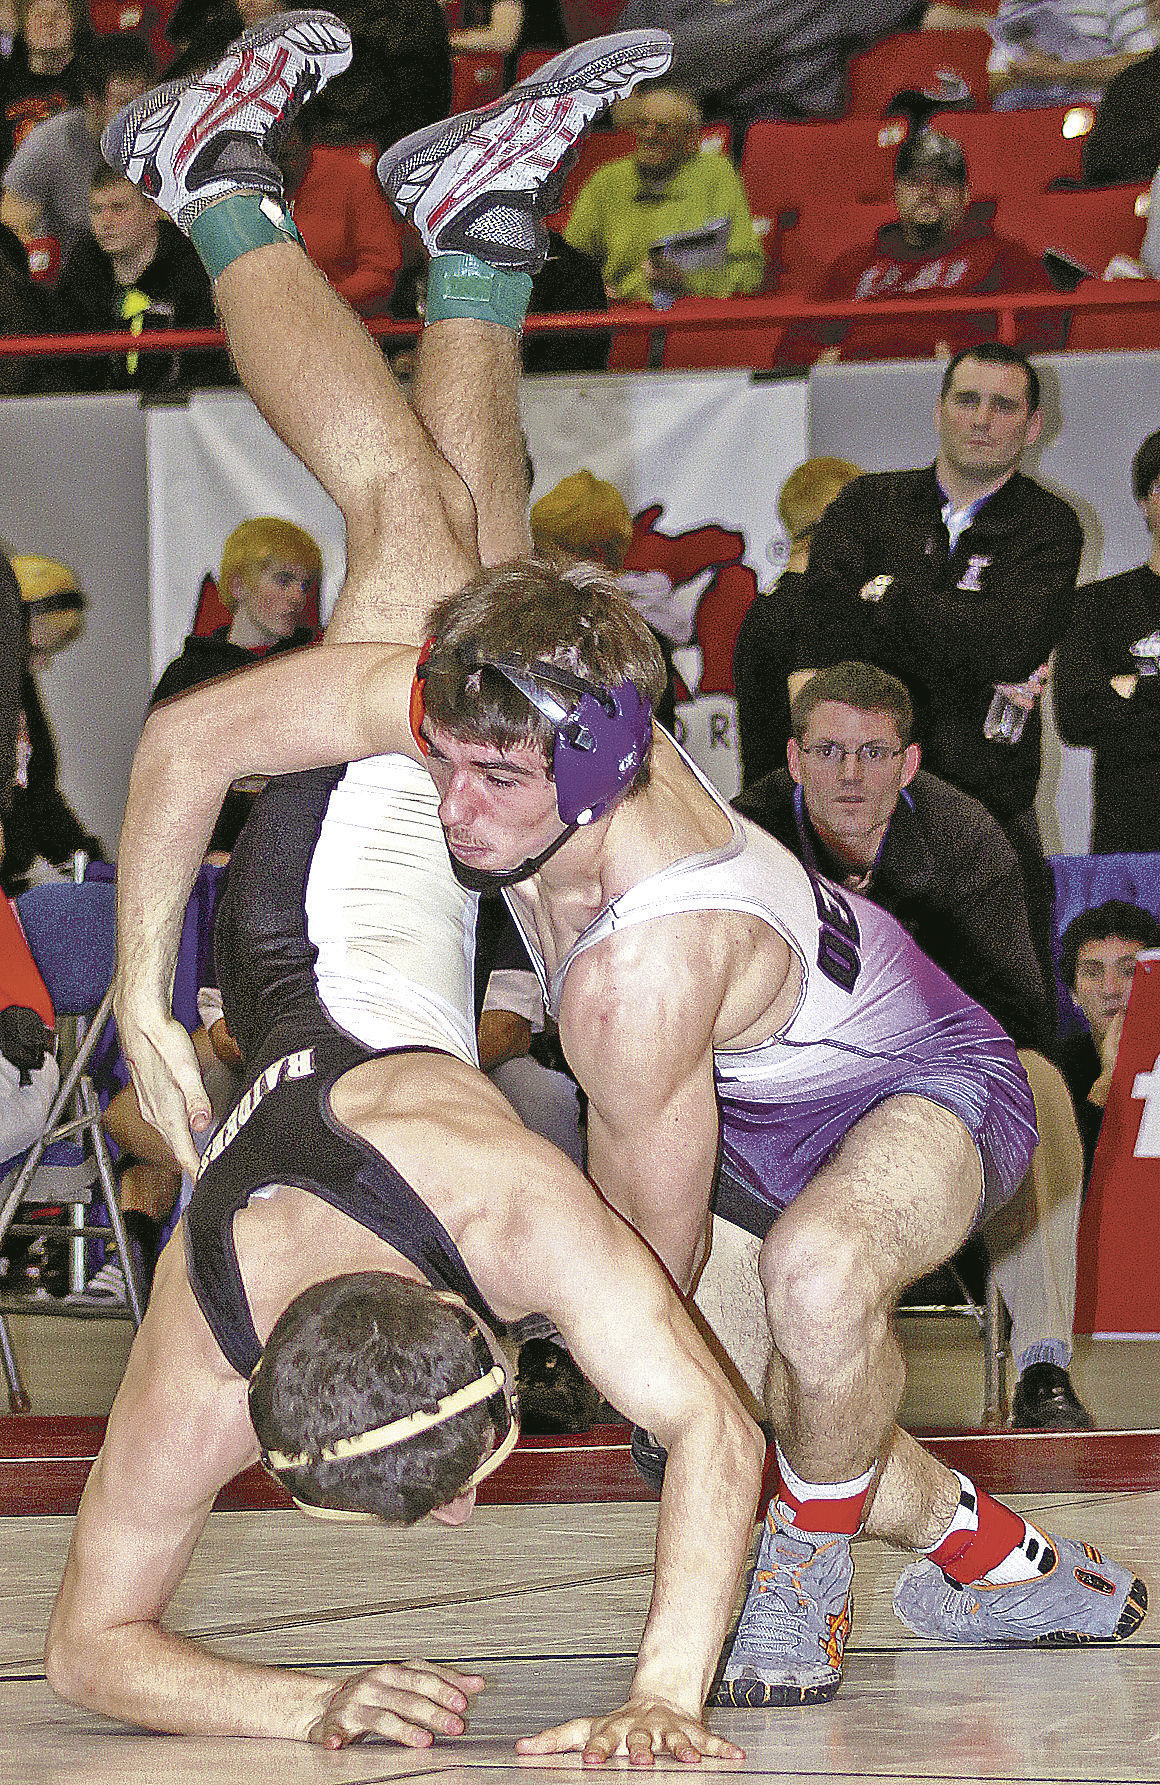 sp.p-s. shelby wrest Trevor Dezwaan works a takedown vs Decatur in quarter finals.jpg